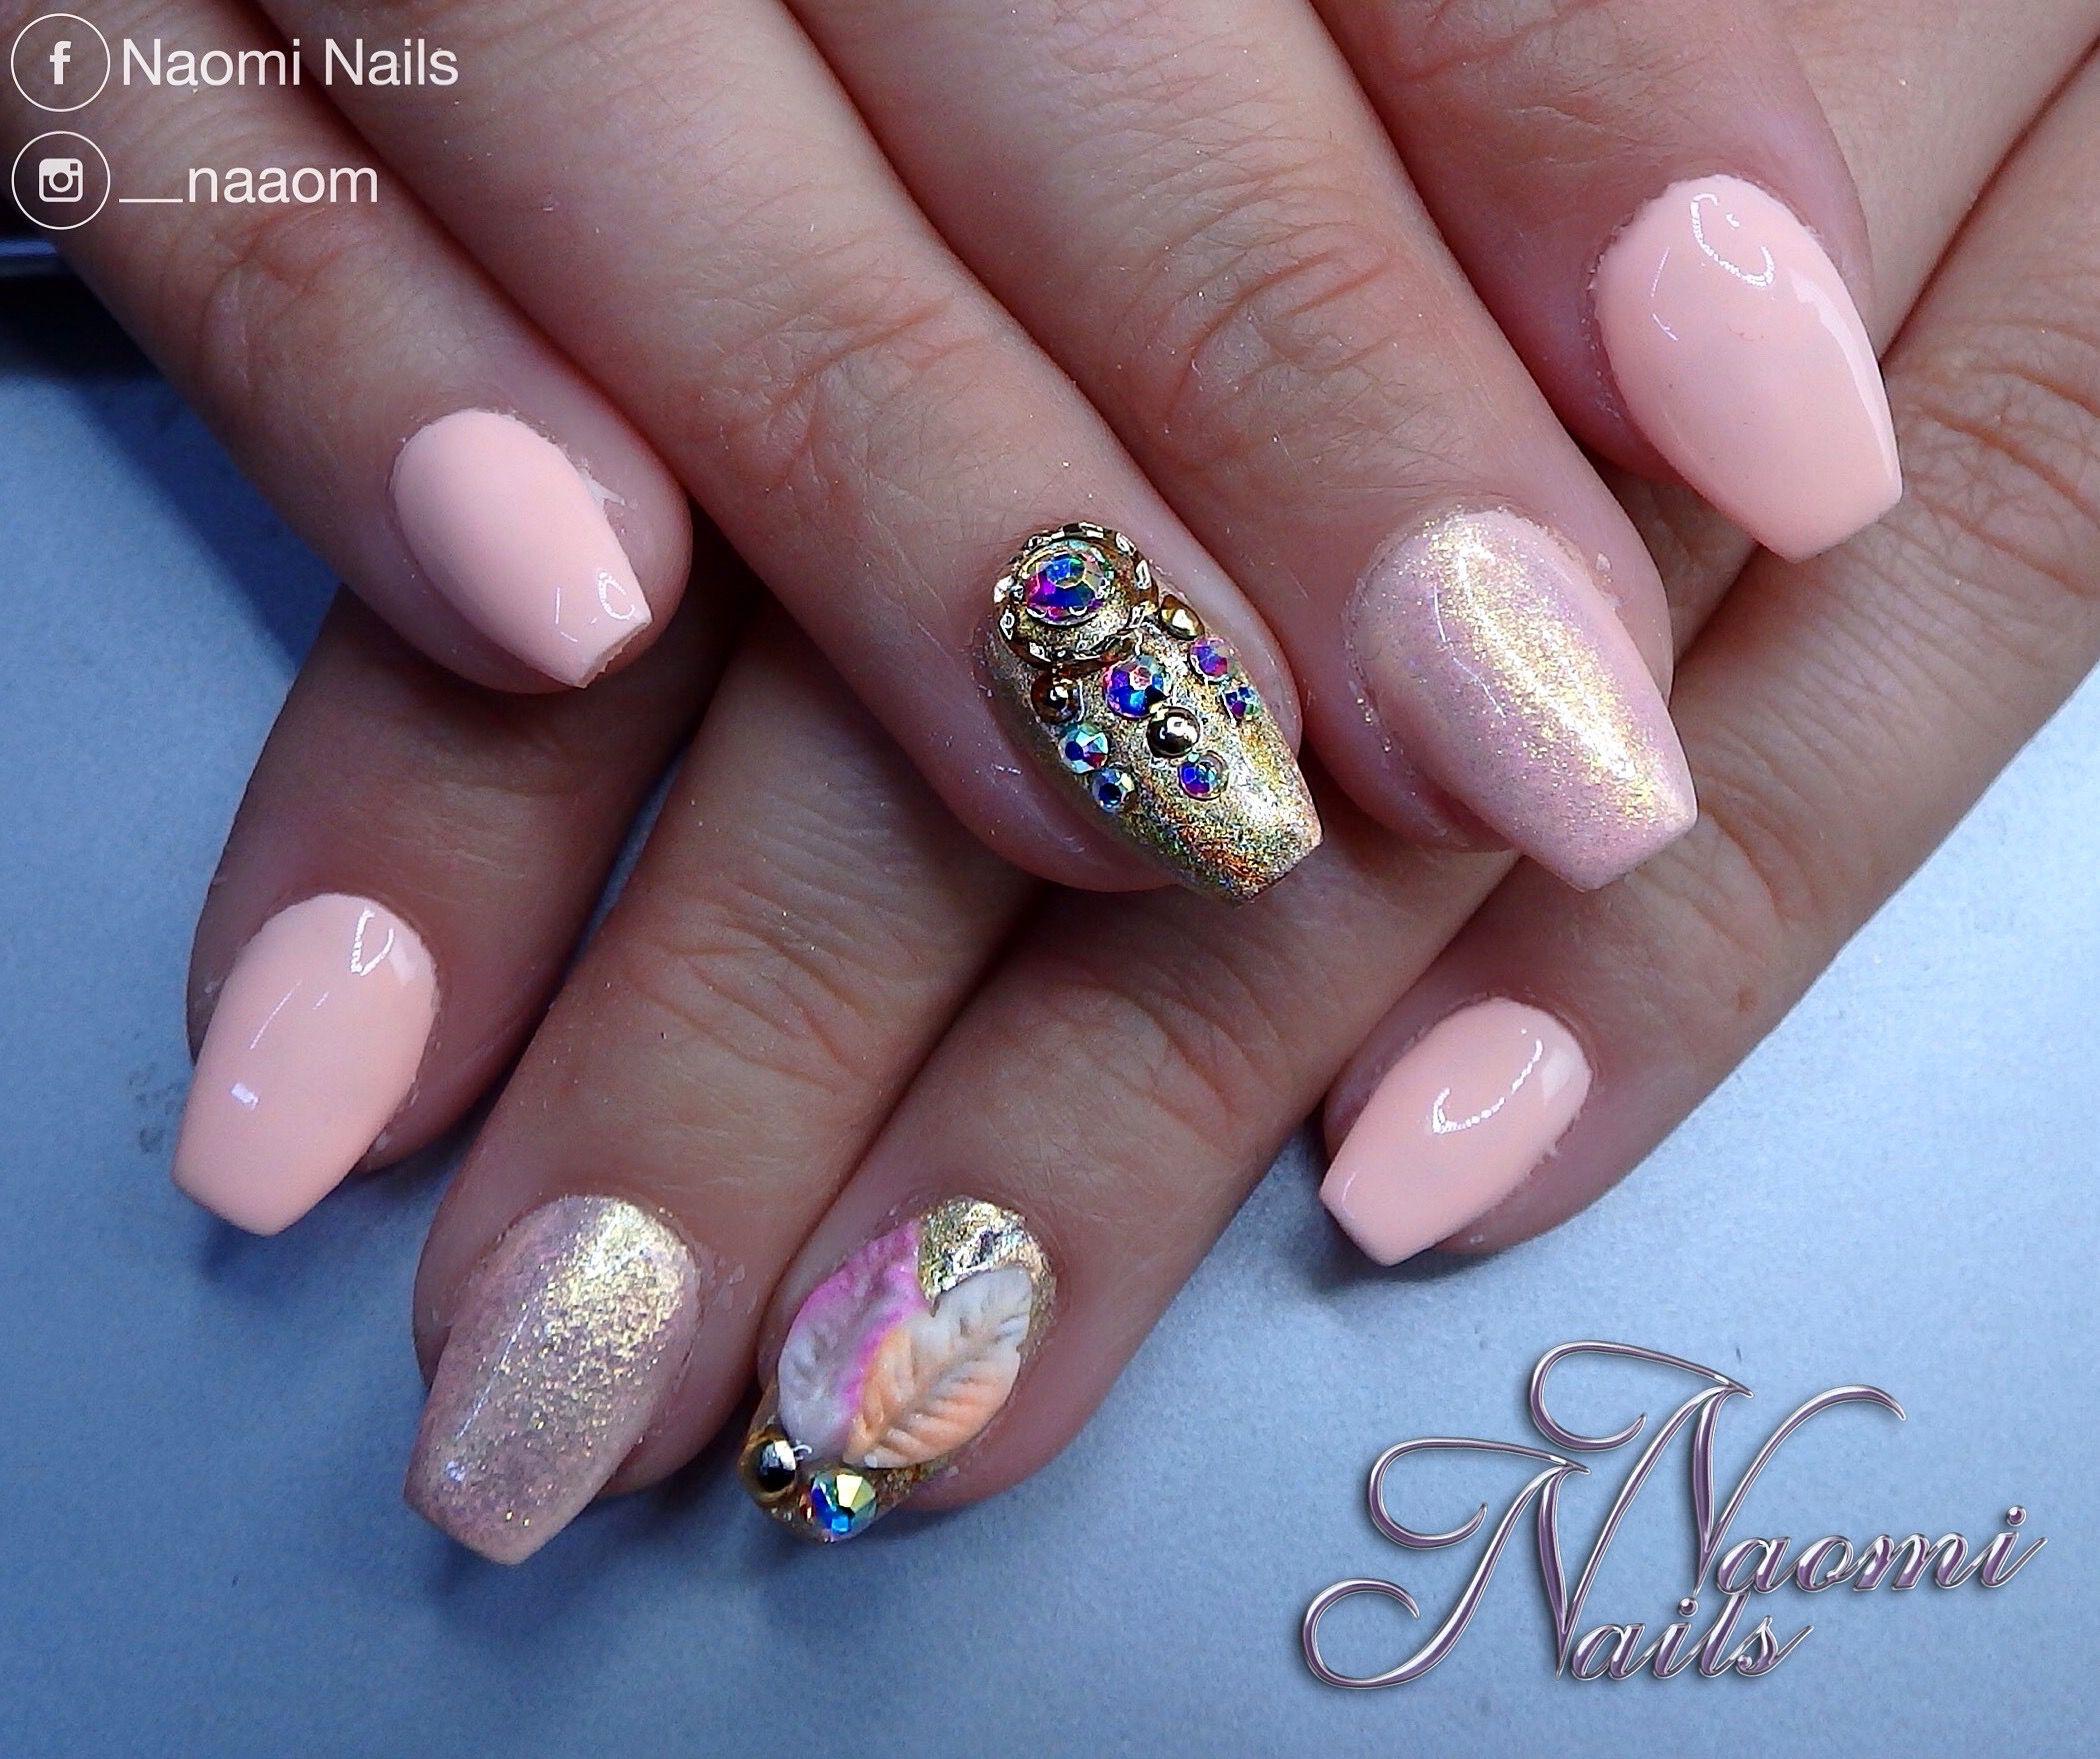 Diva Gellak Fleur d\'Oranger | Nails | Pinterest